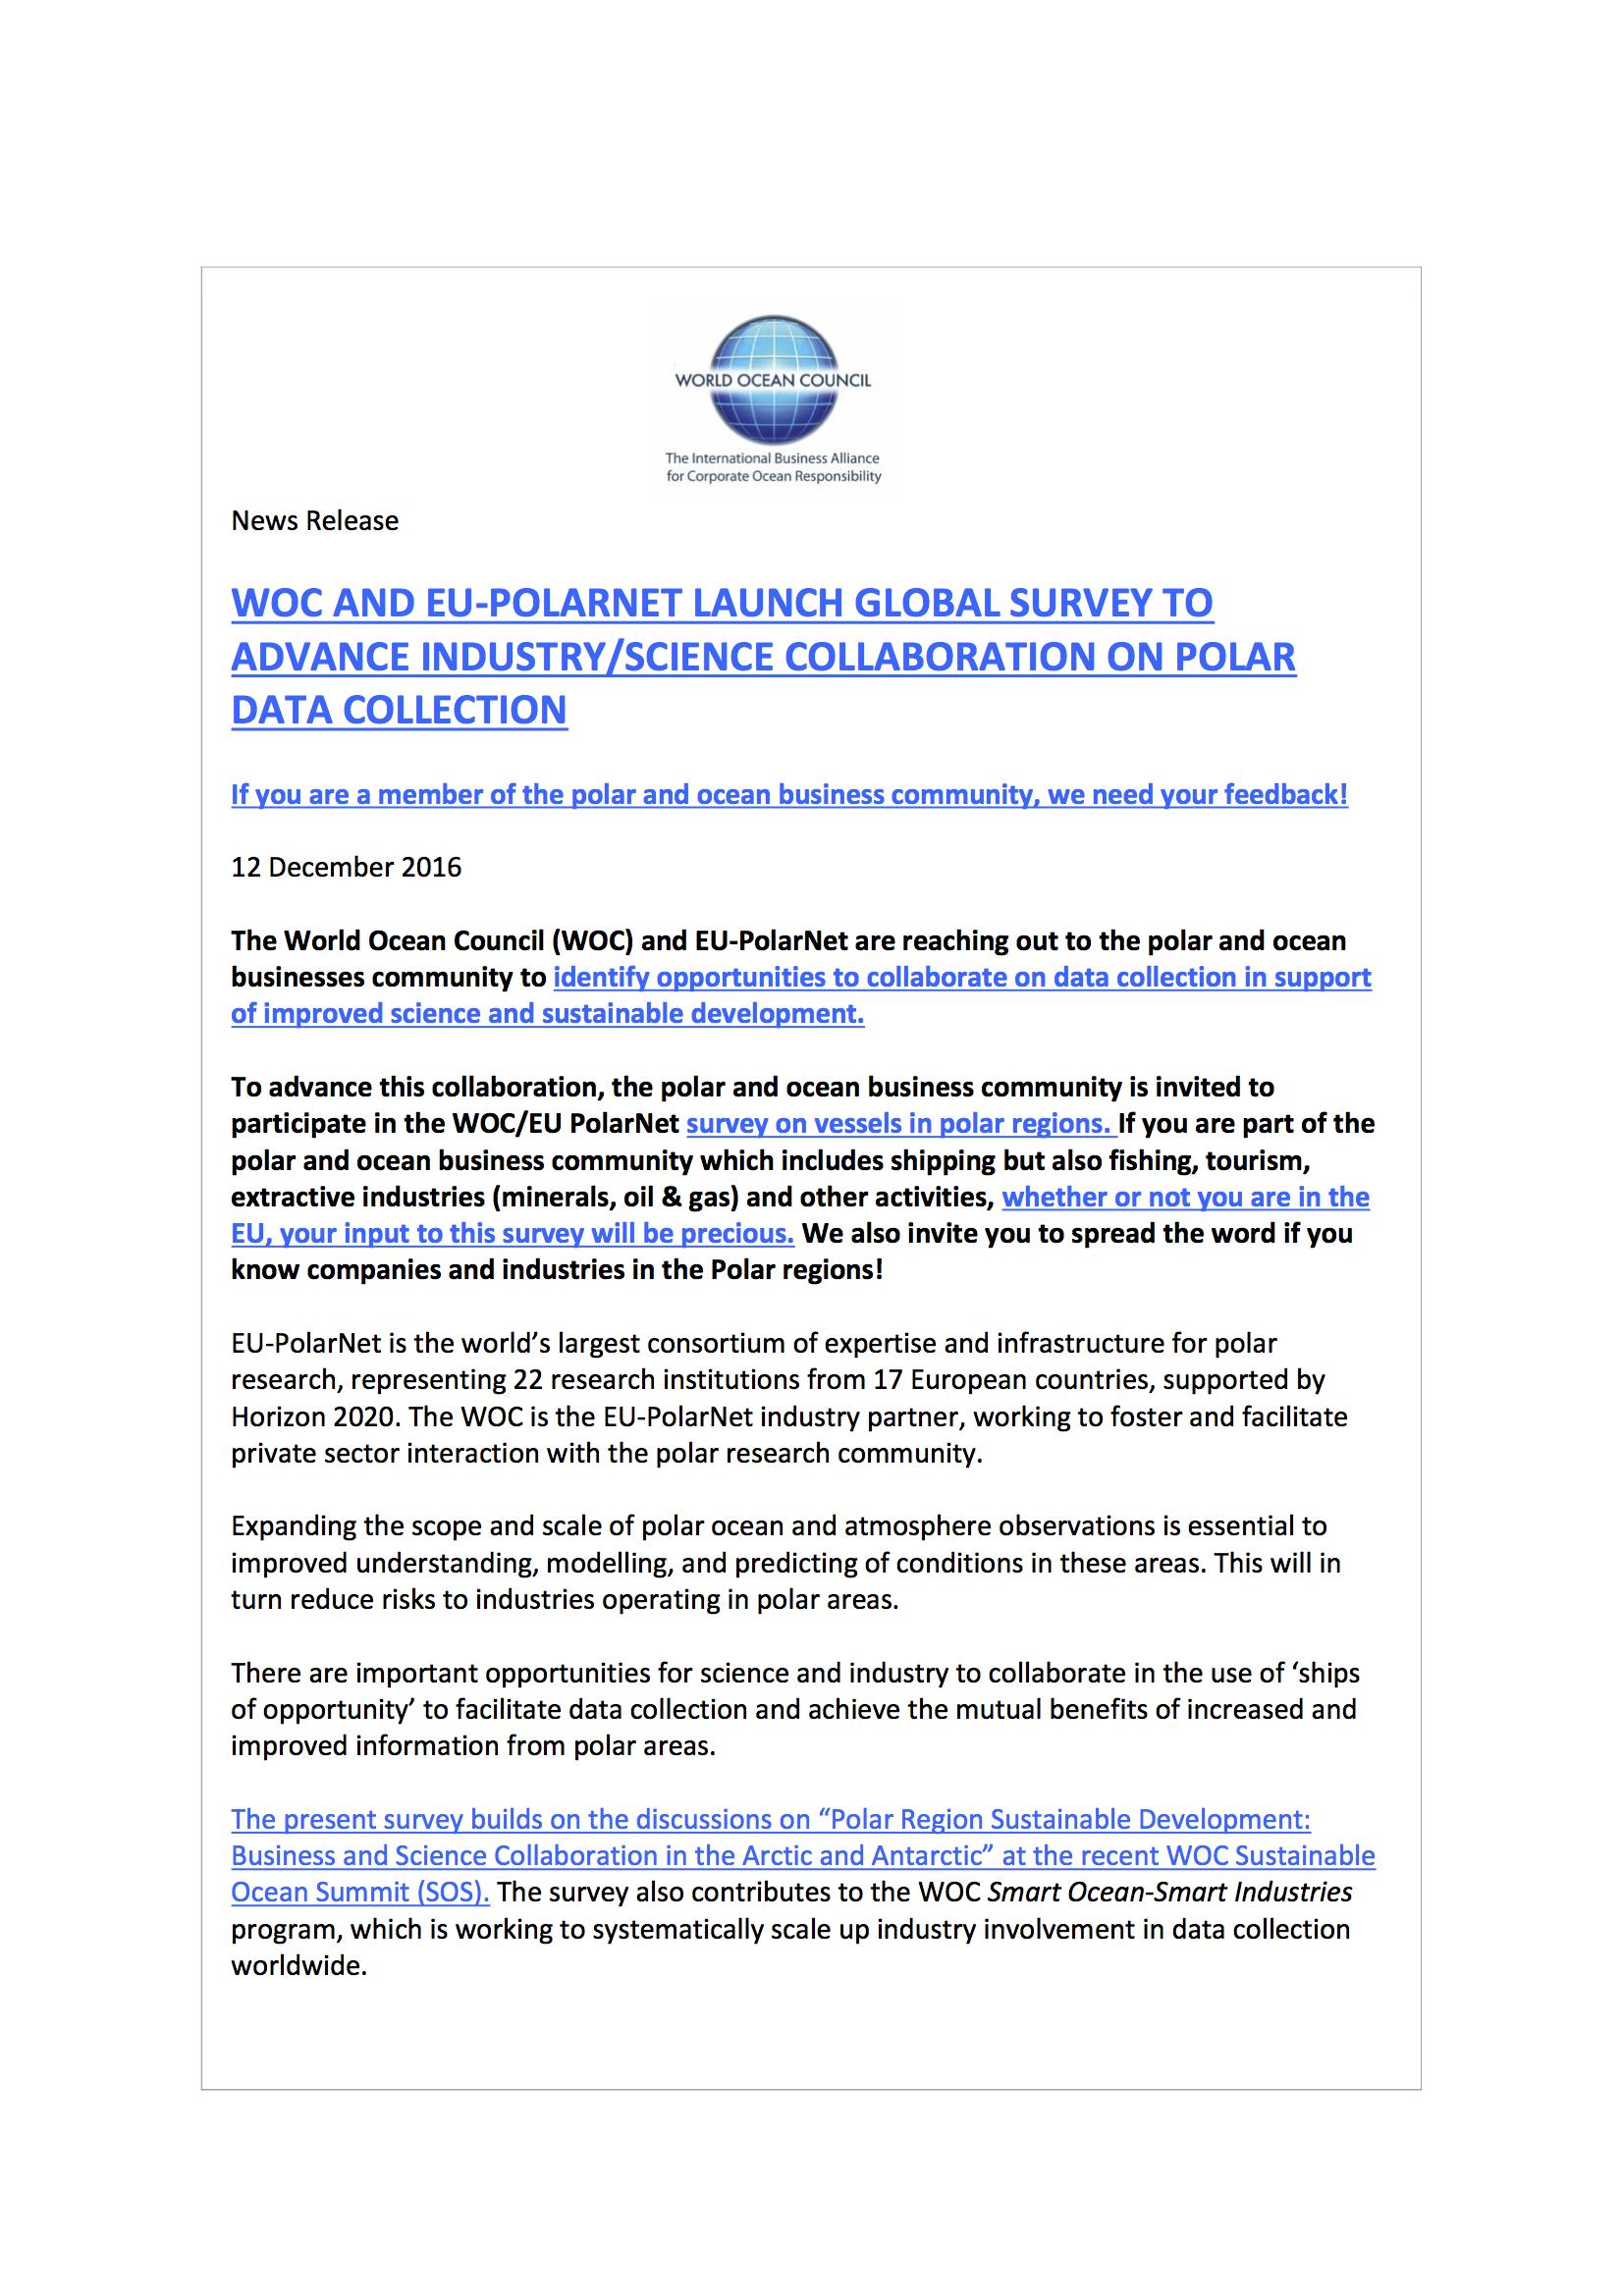 EU Polar Net and World Ocean Council Polar Regions Collaboration